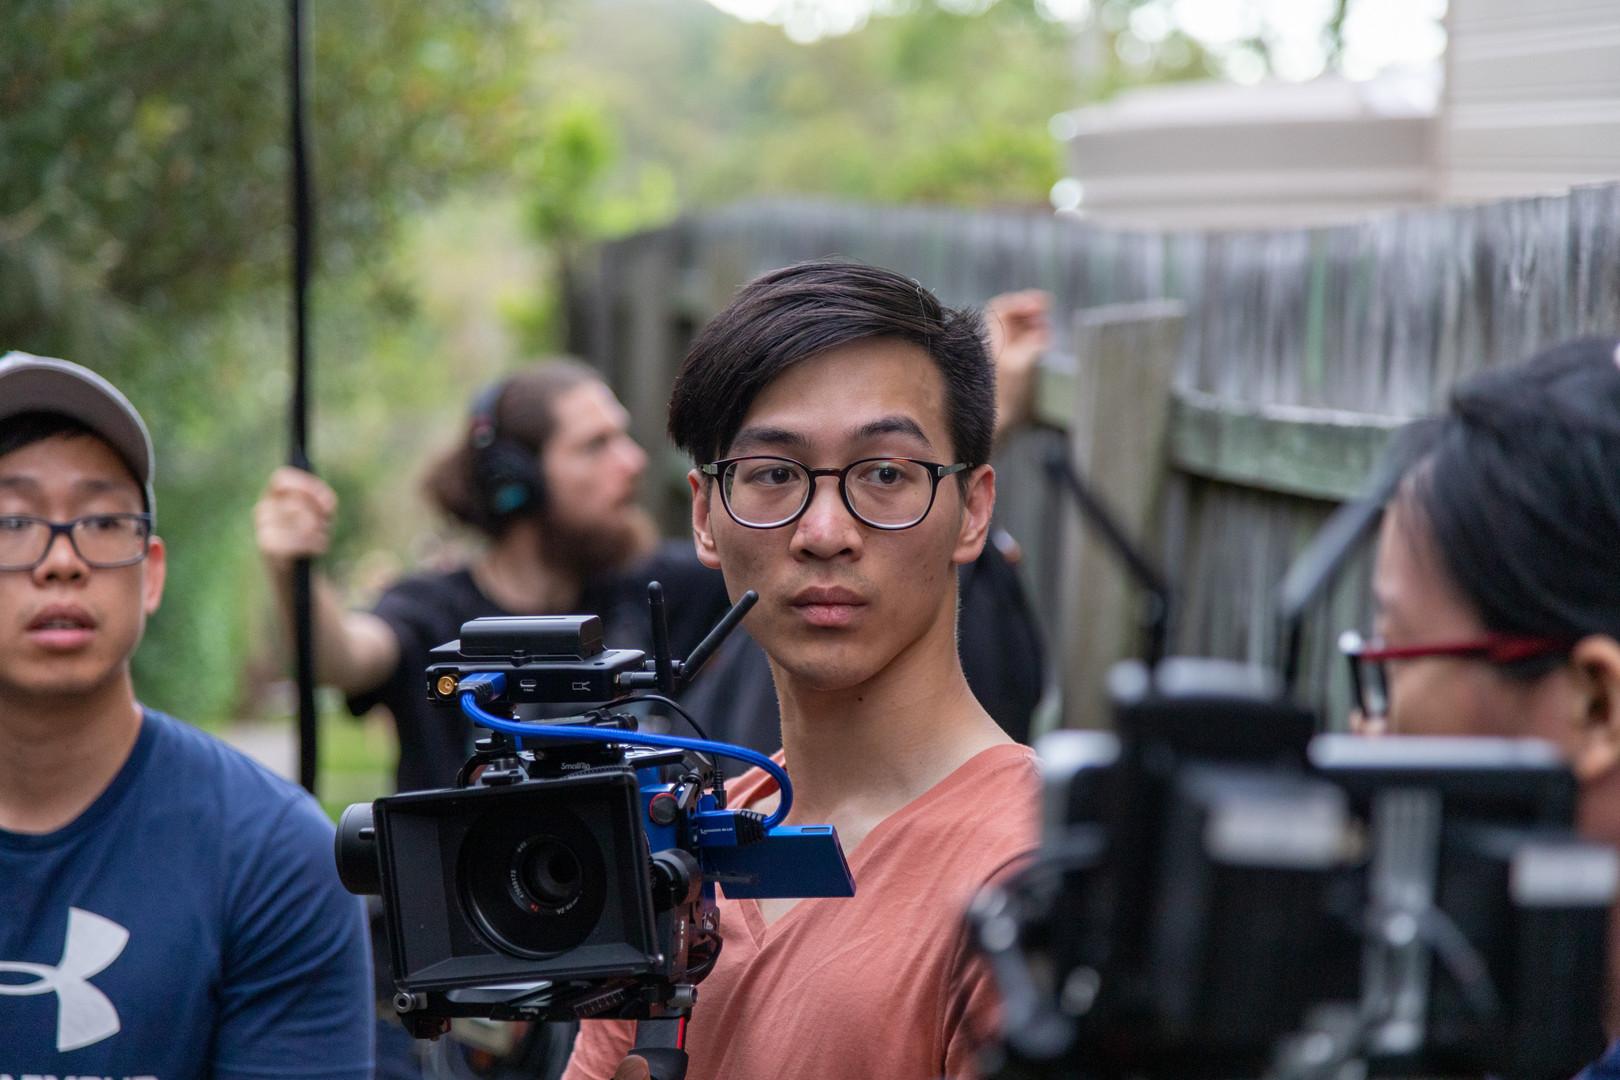 Chris Chung (Gimbal Operator)